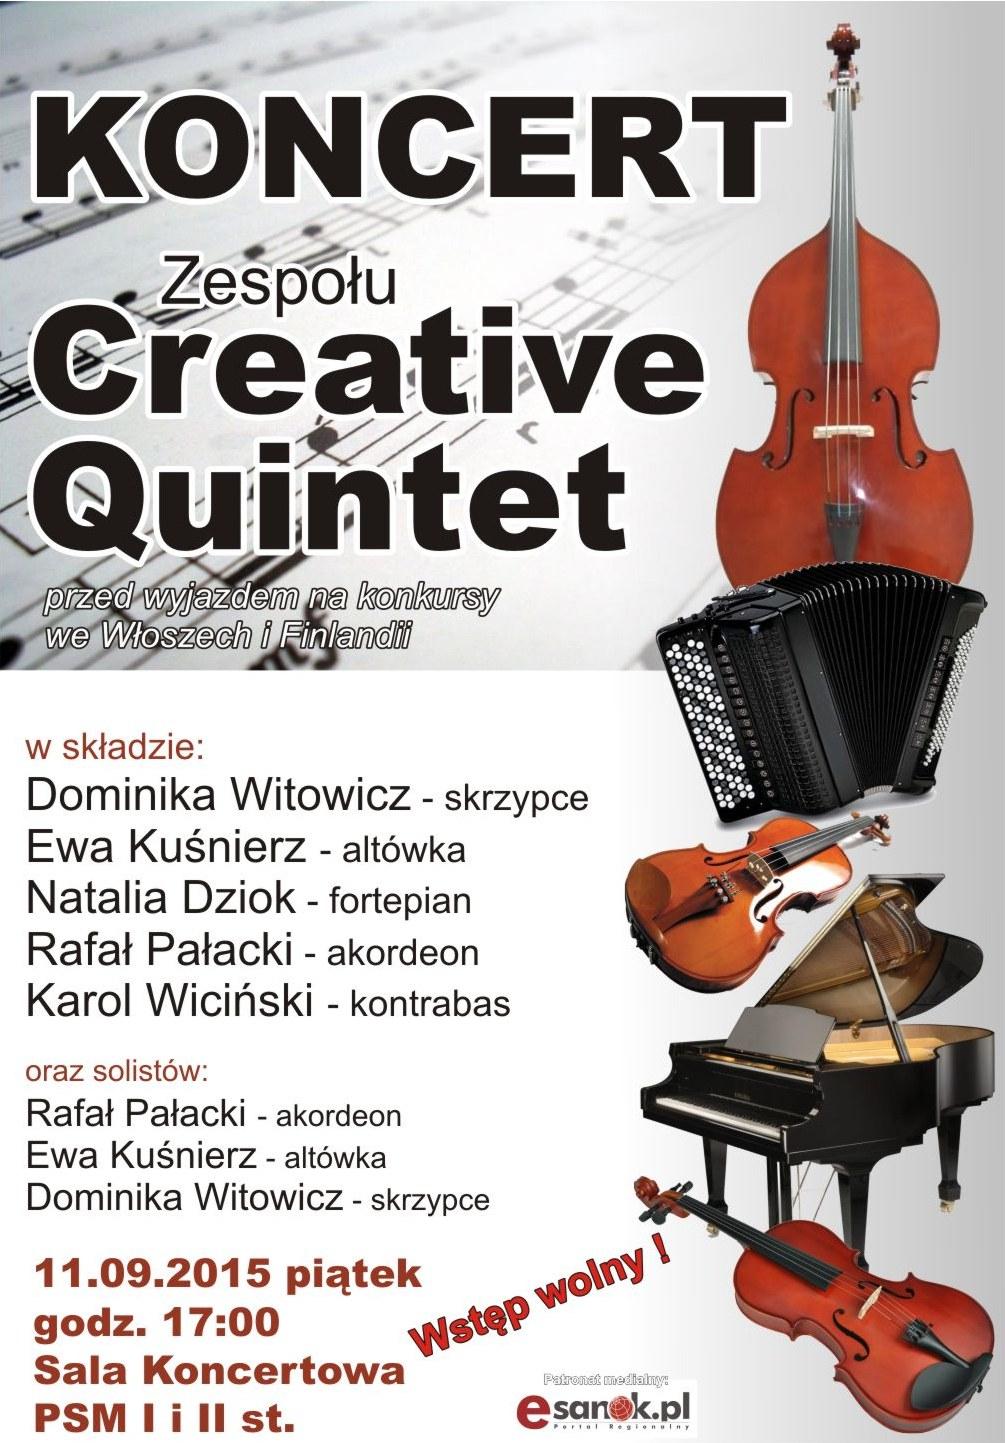 Koncert Creative Quintet 11-09-2015